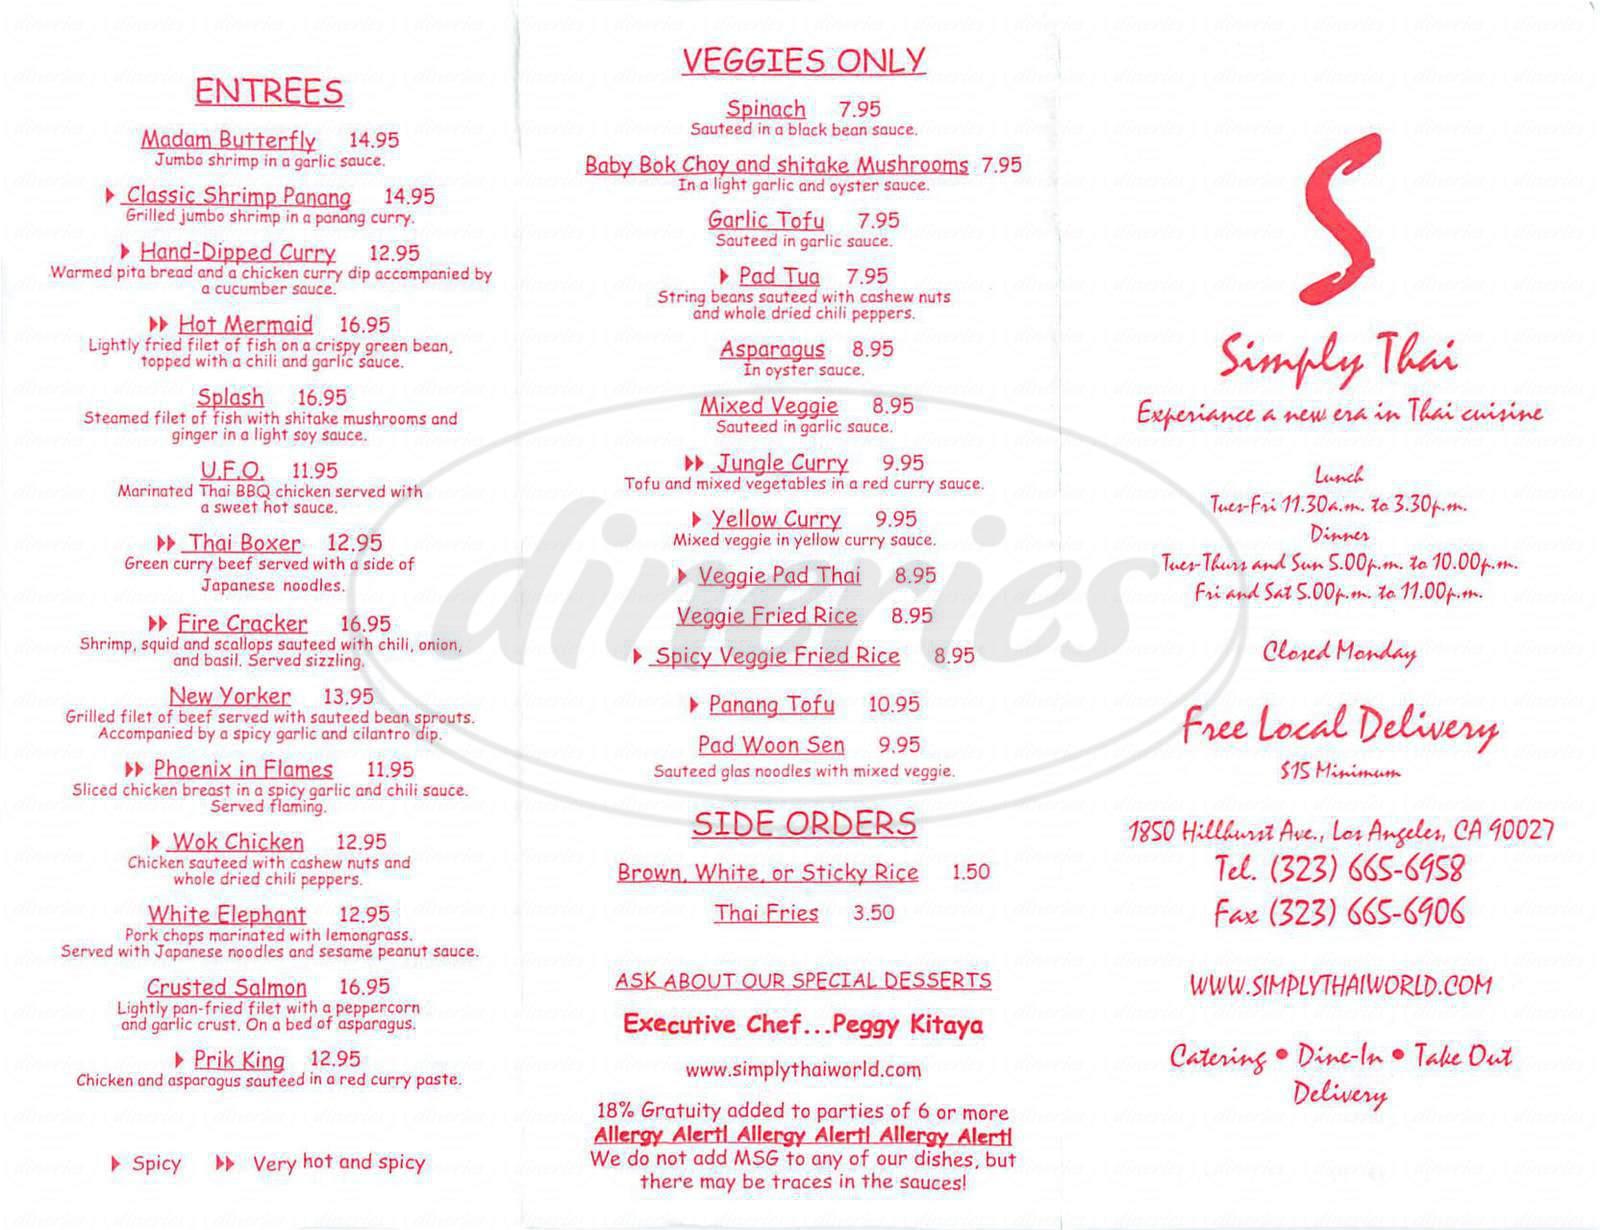 menu for Simply Thai Restaurant